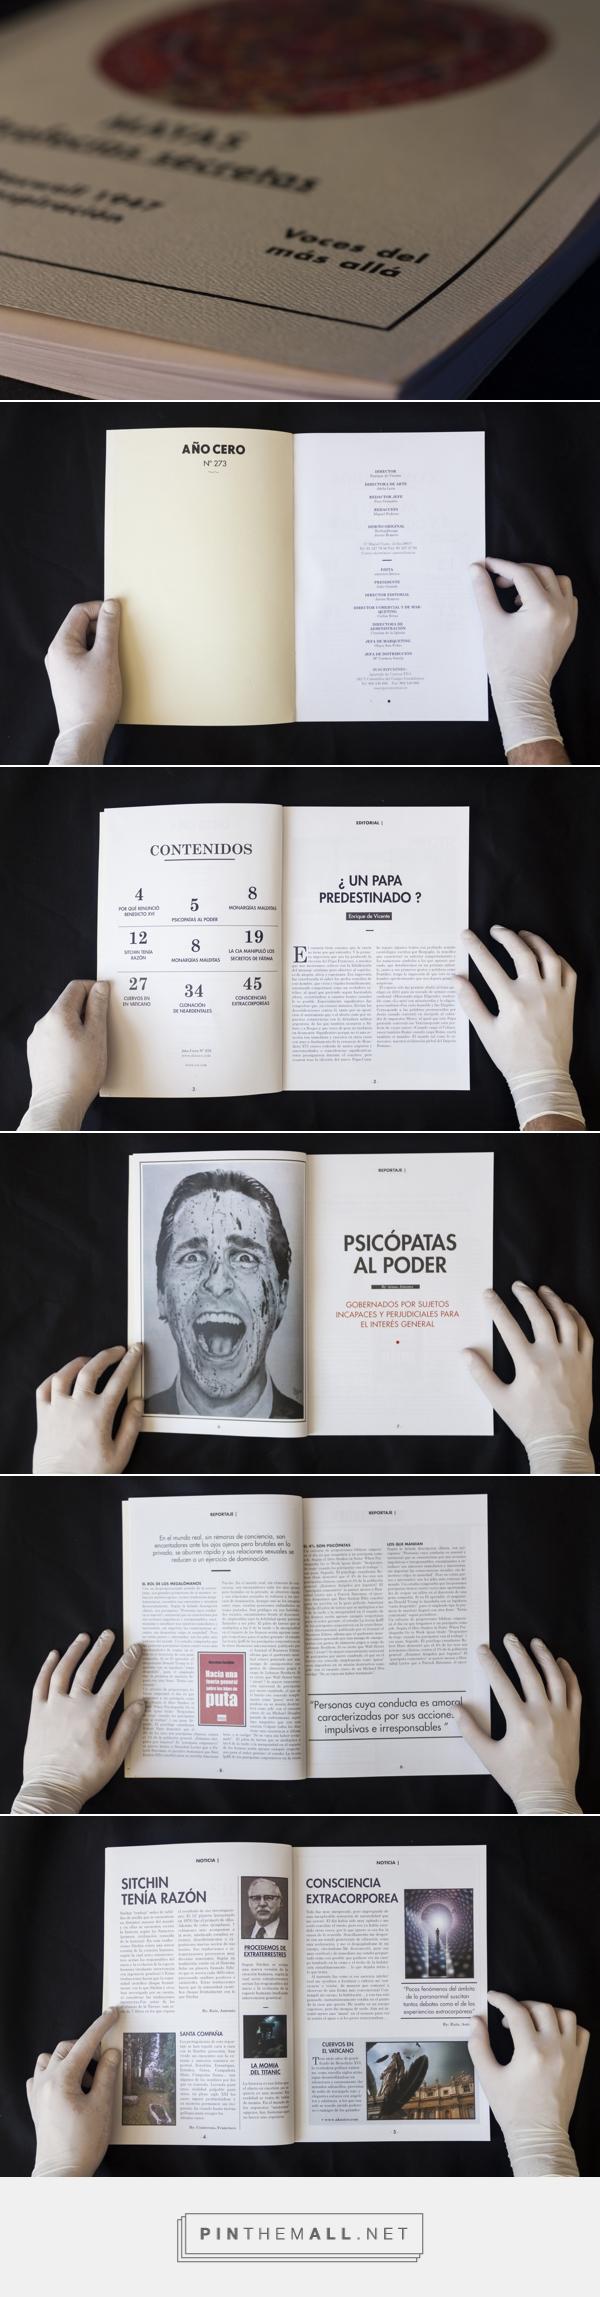 Rediseño Año Cero (Parte I: Revista) | Domestika - created via http://pinthemall.net